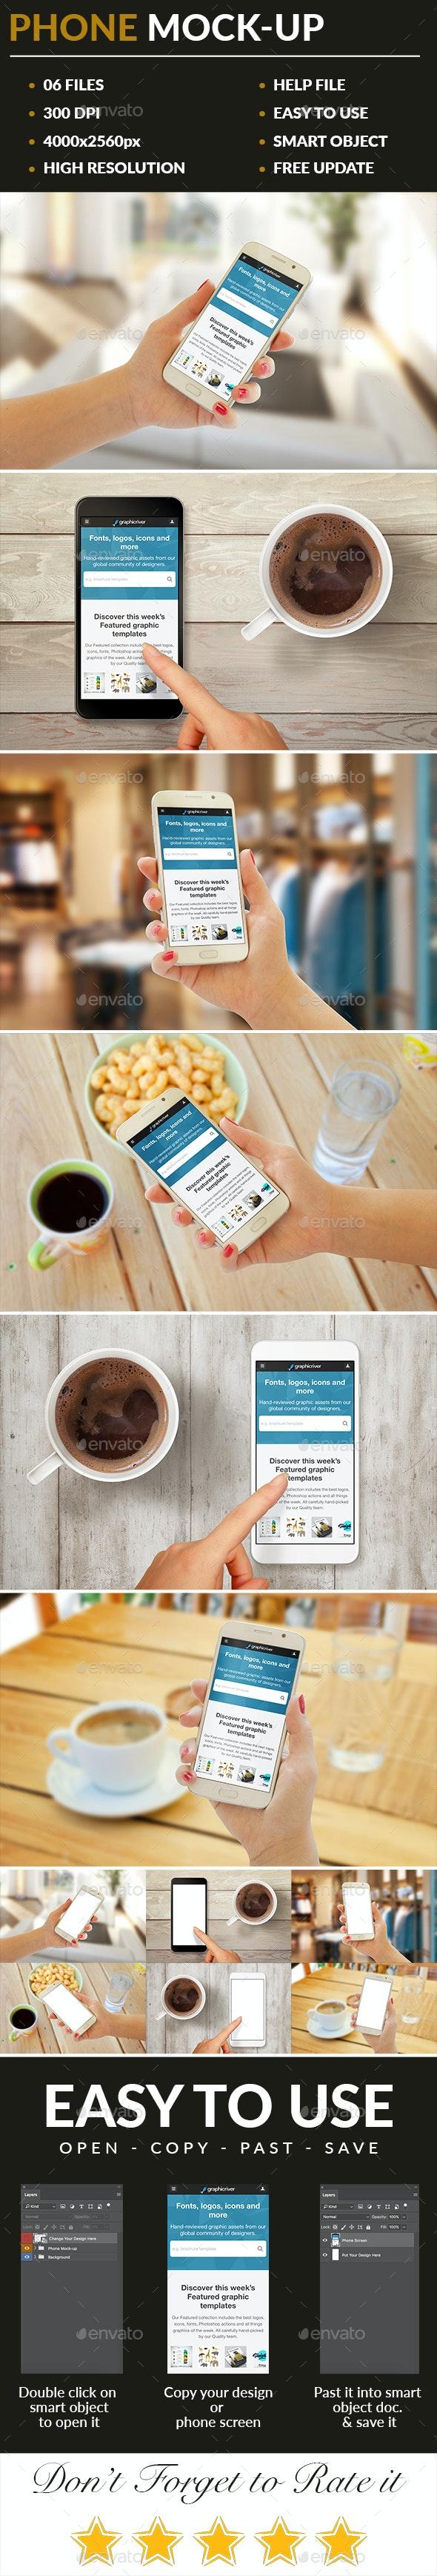 6 Phone Mock-Ups - Mobile Displays